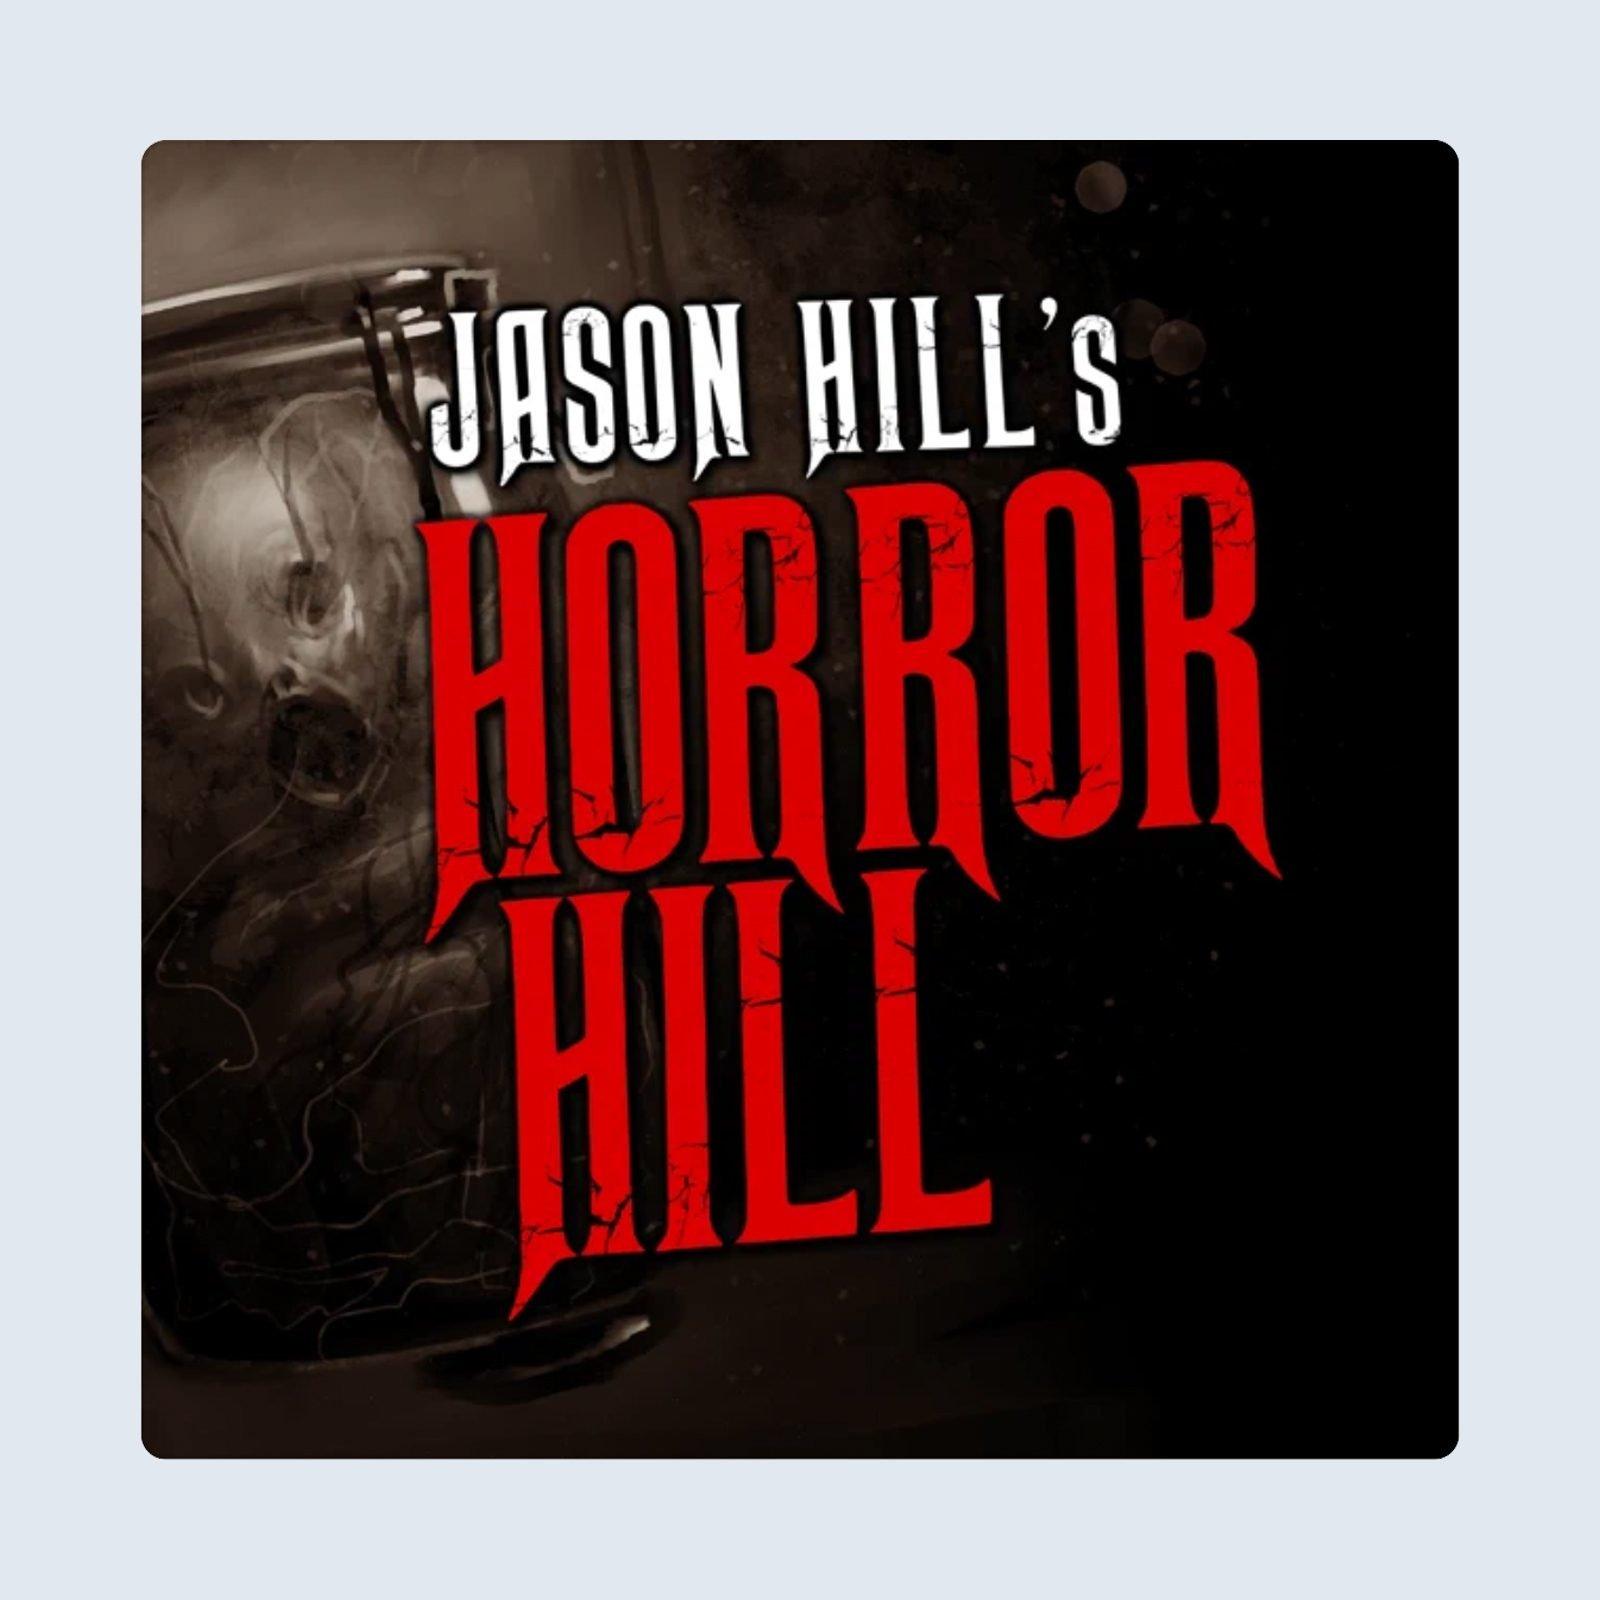 Jason Hills Horror Hill Podcast